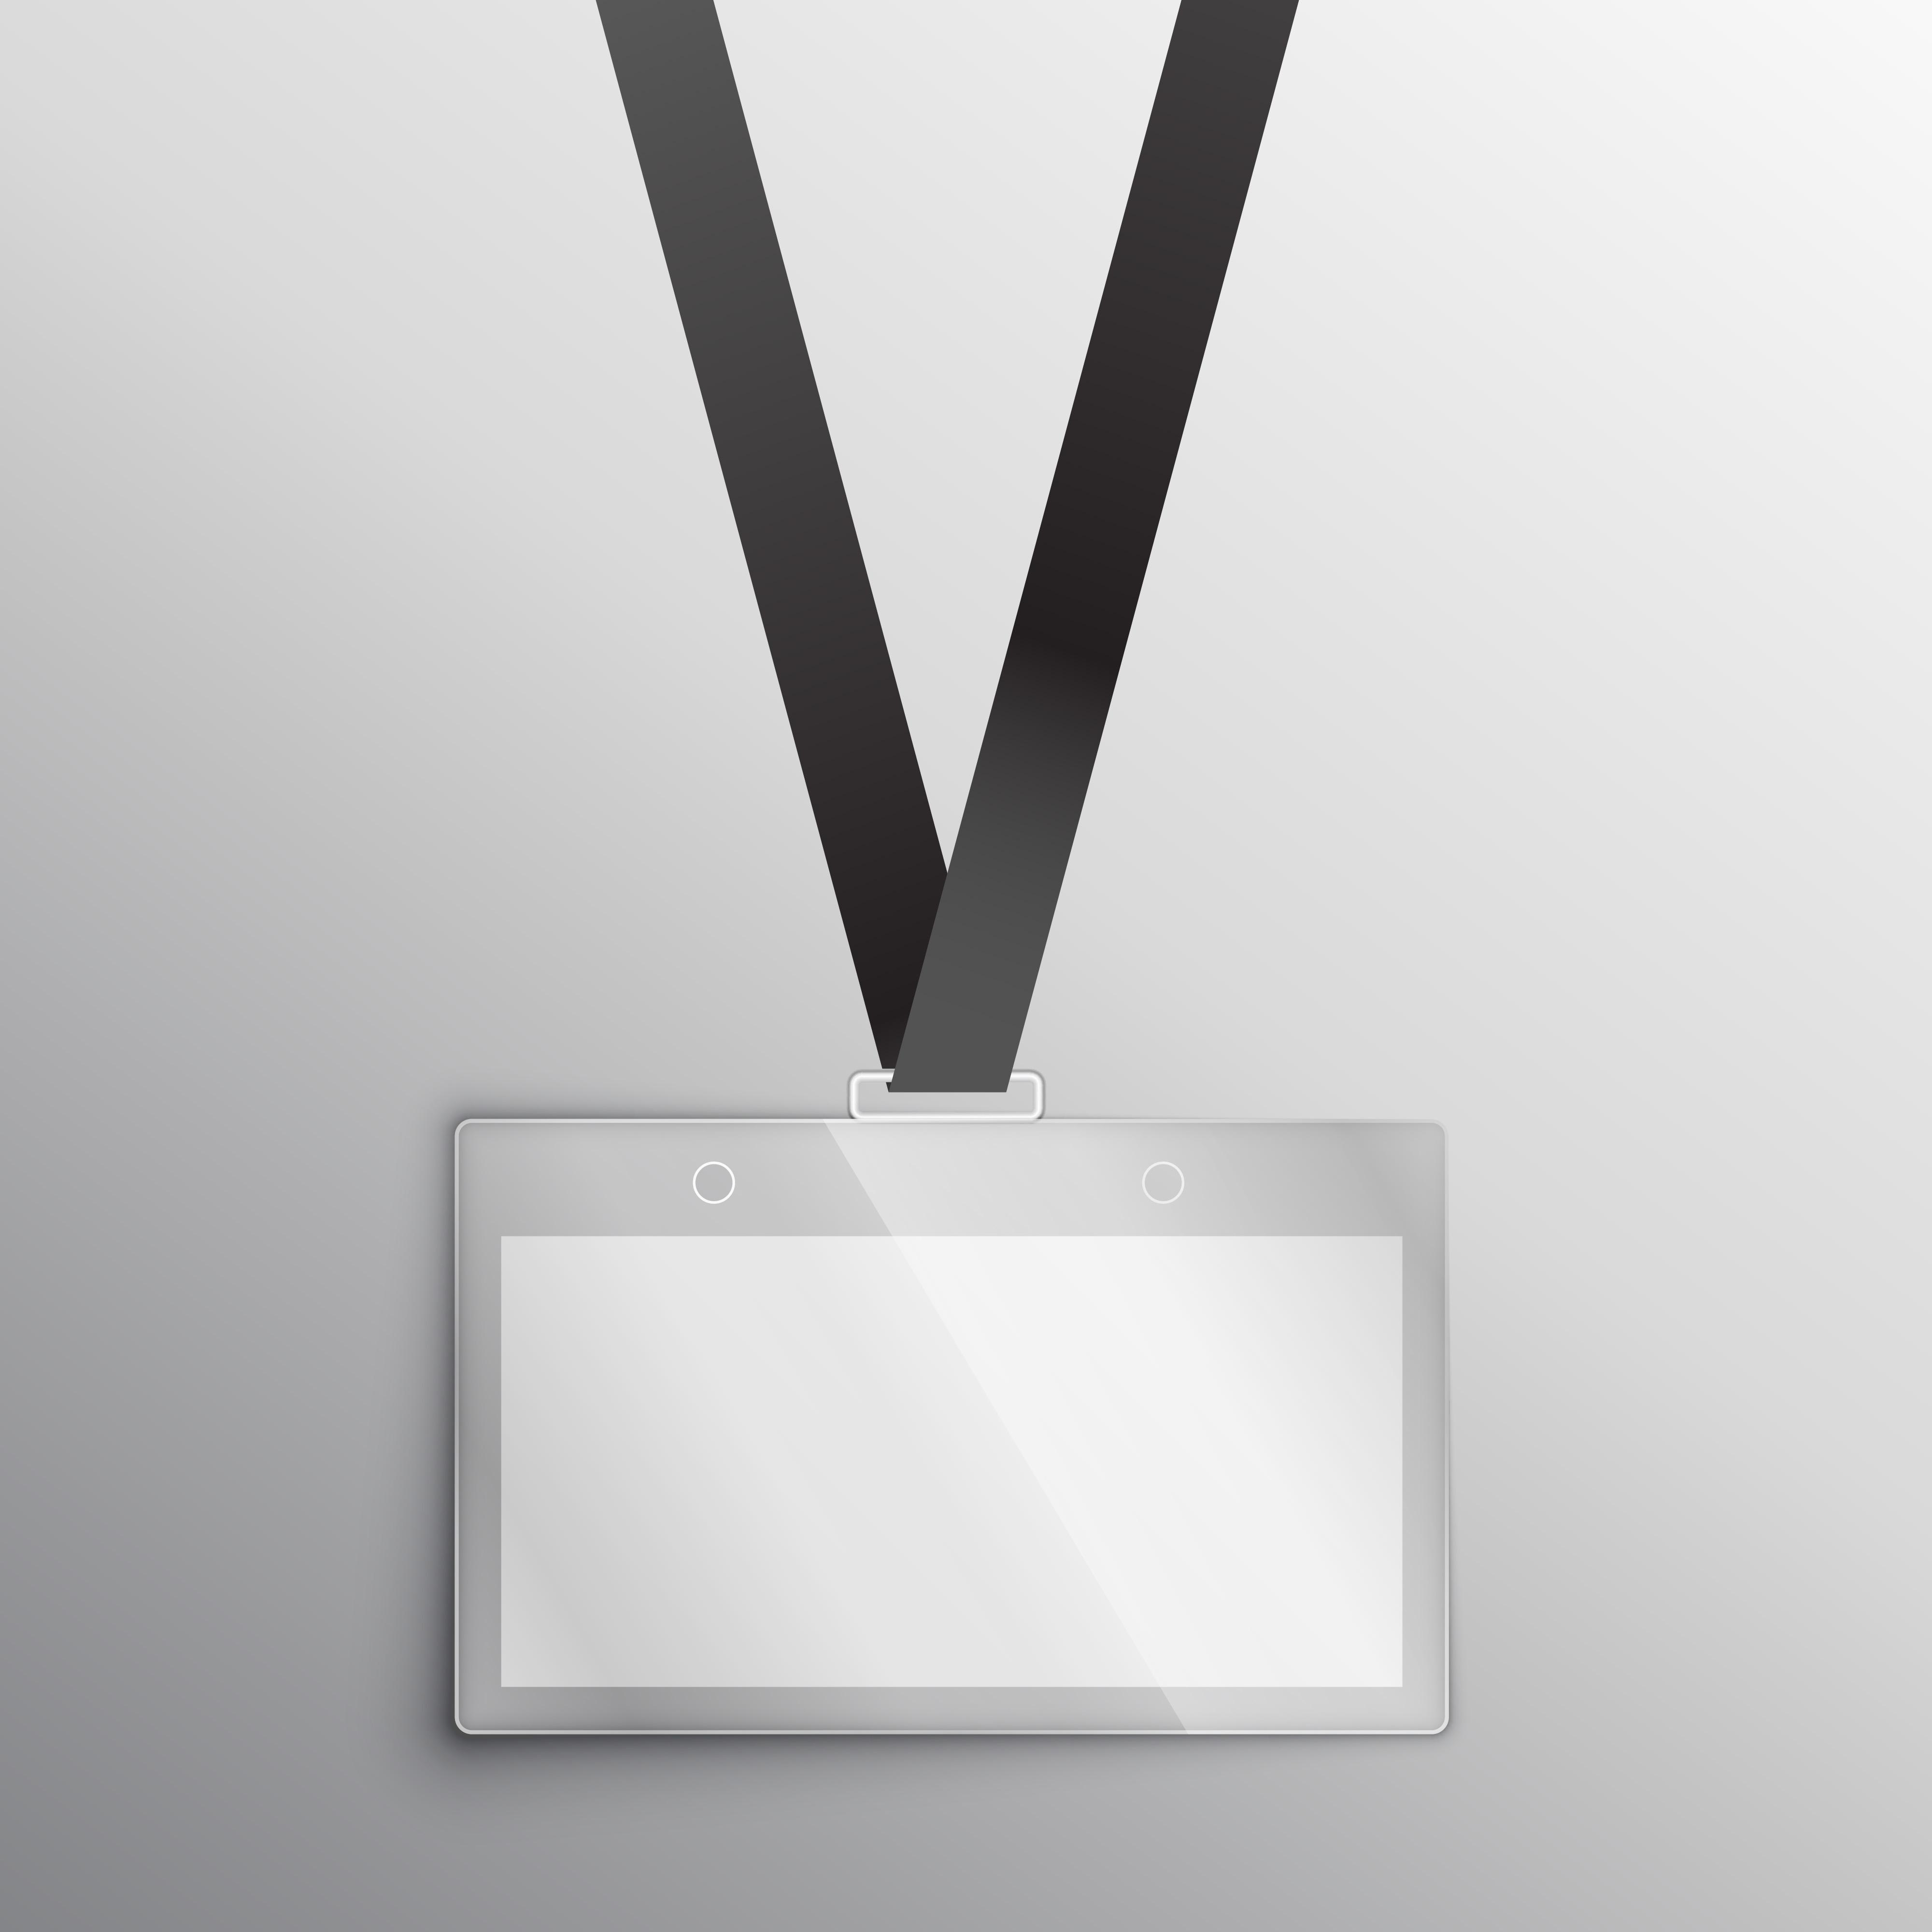 Name Badge Free Vector Art - (5011 Free Downloads)